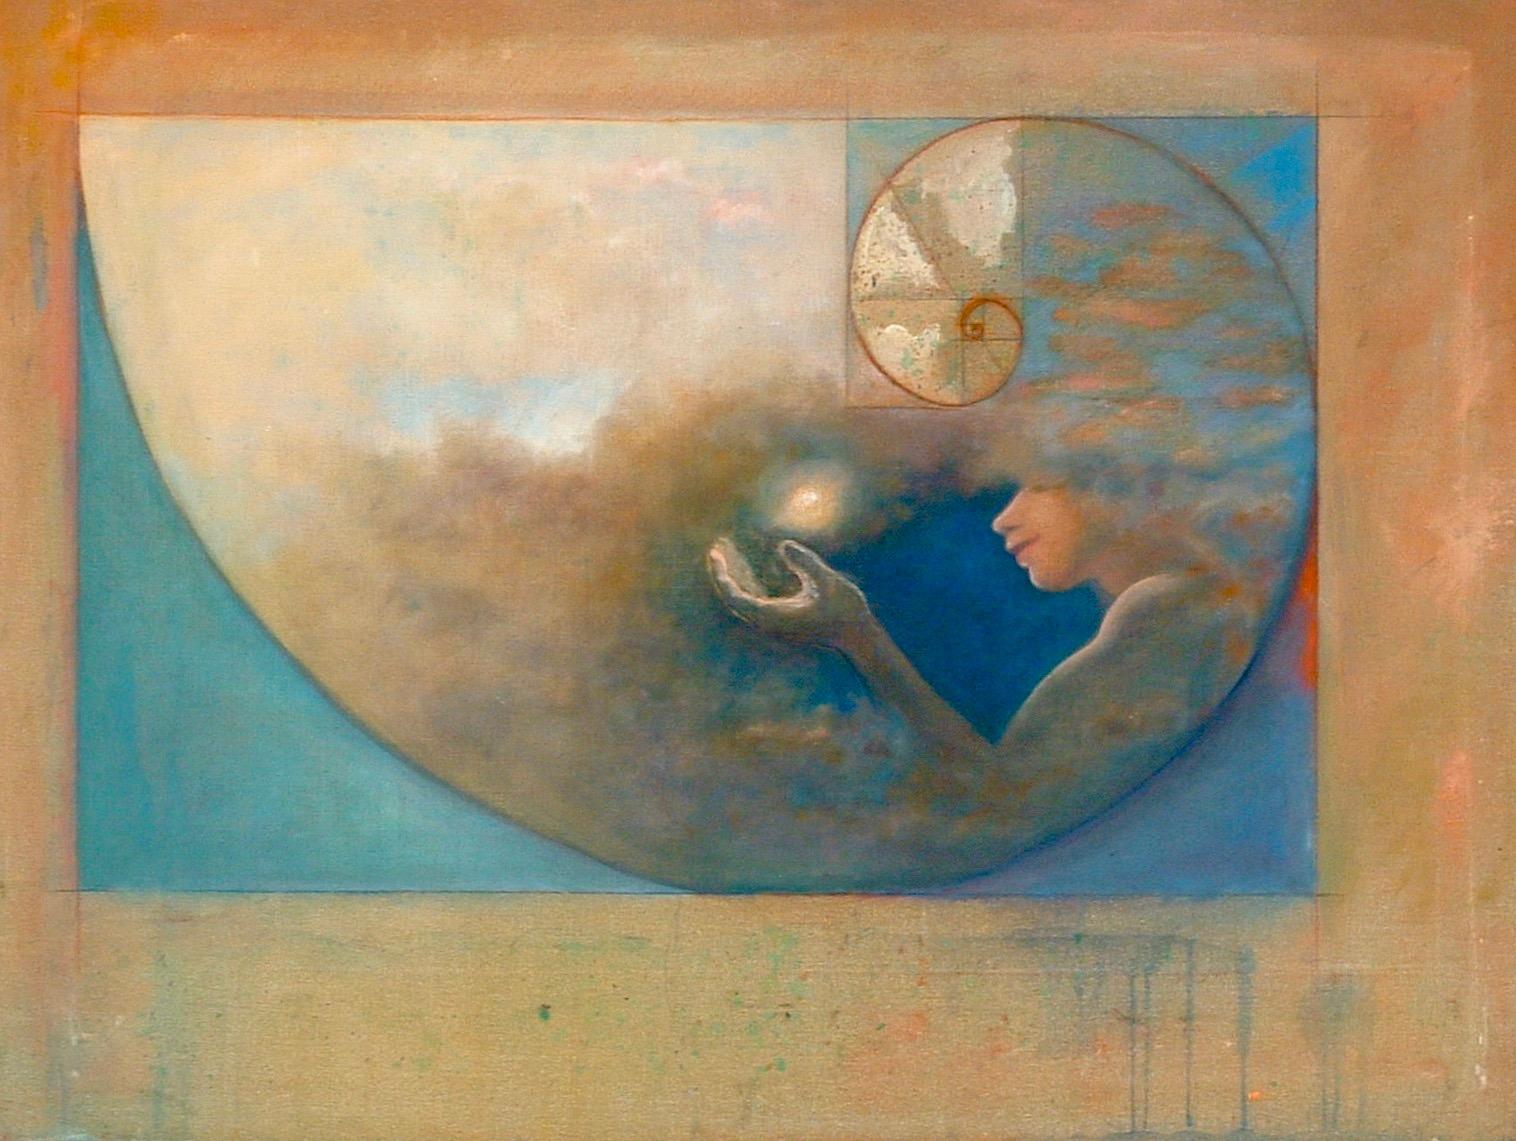 Awakening (Fibinacci Sequence) Mixed Media on Canvas 2.5' x 4'